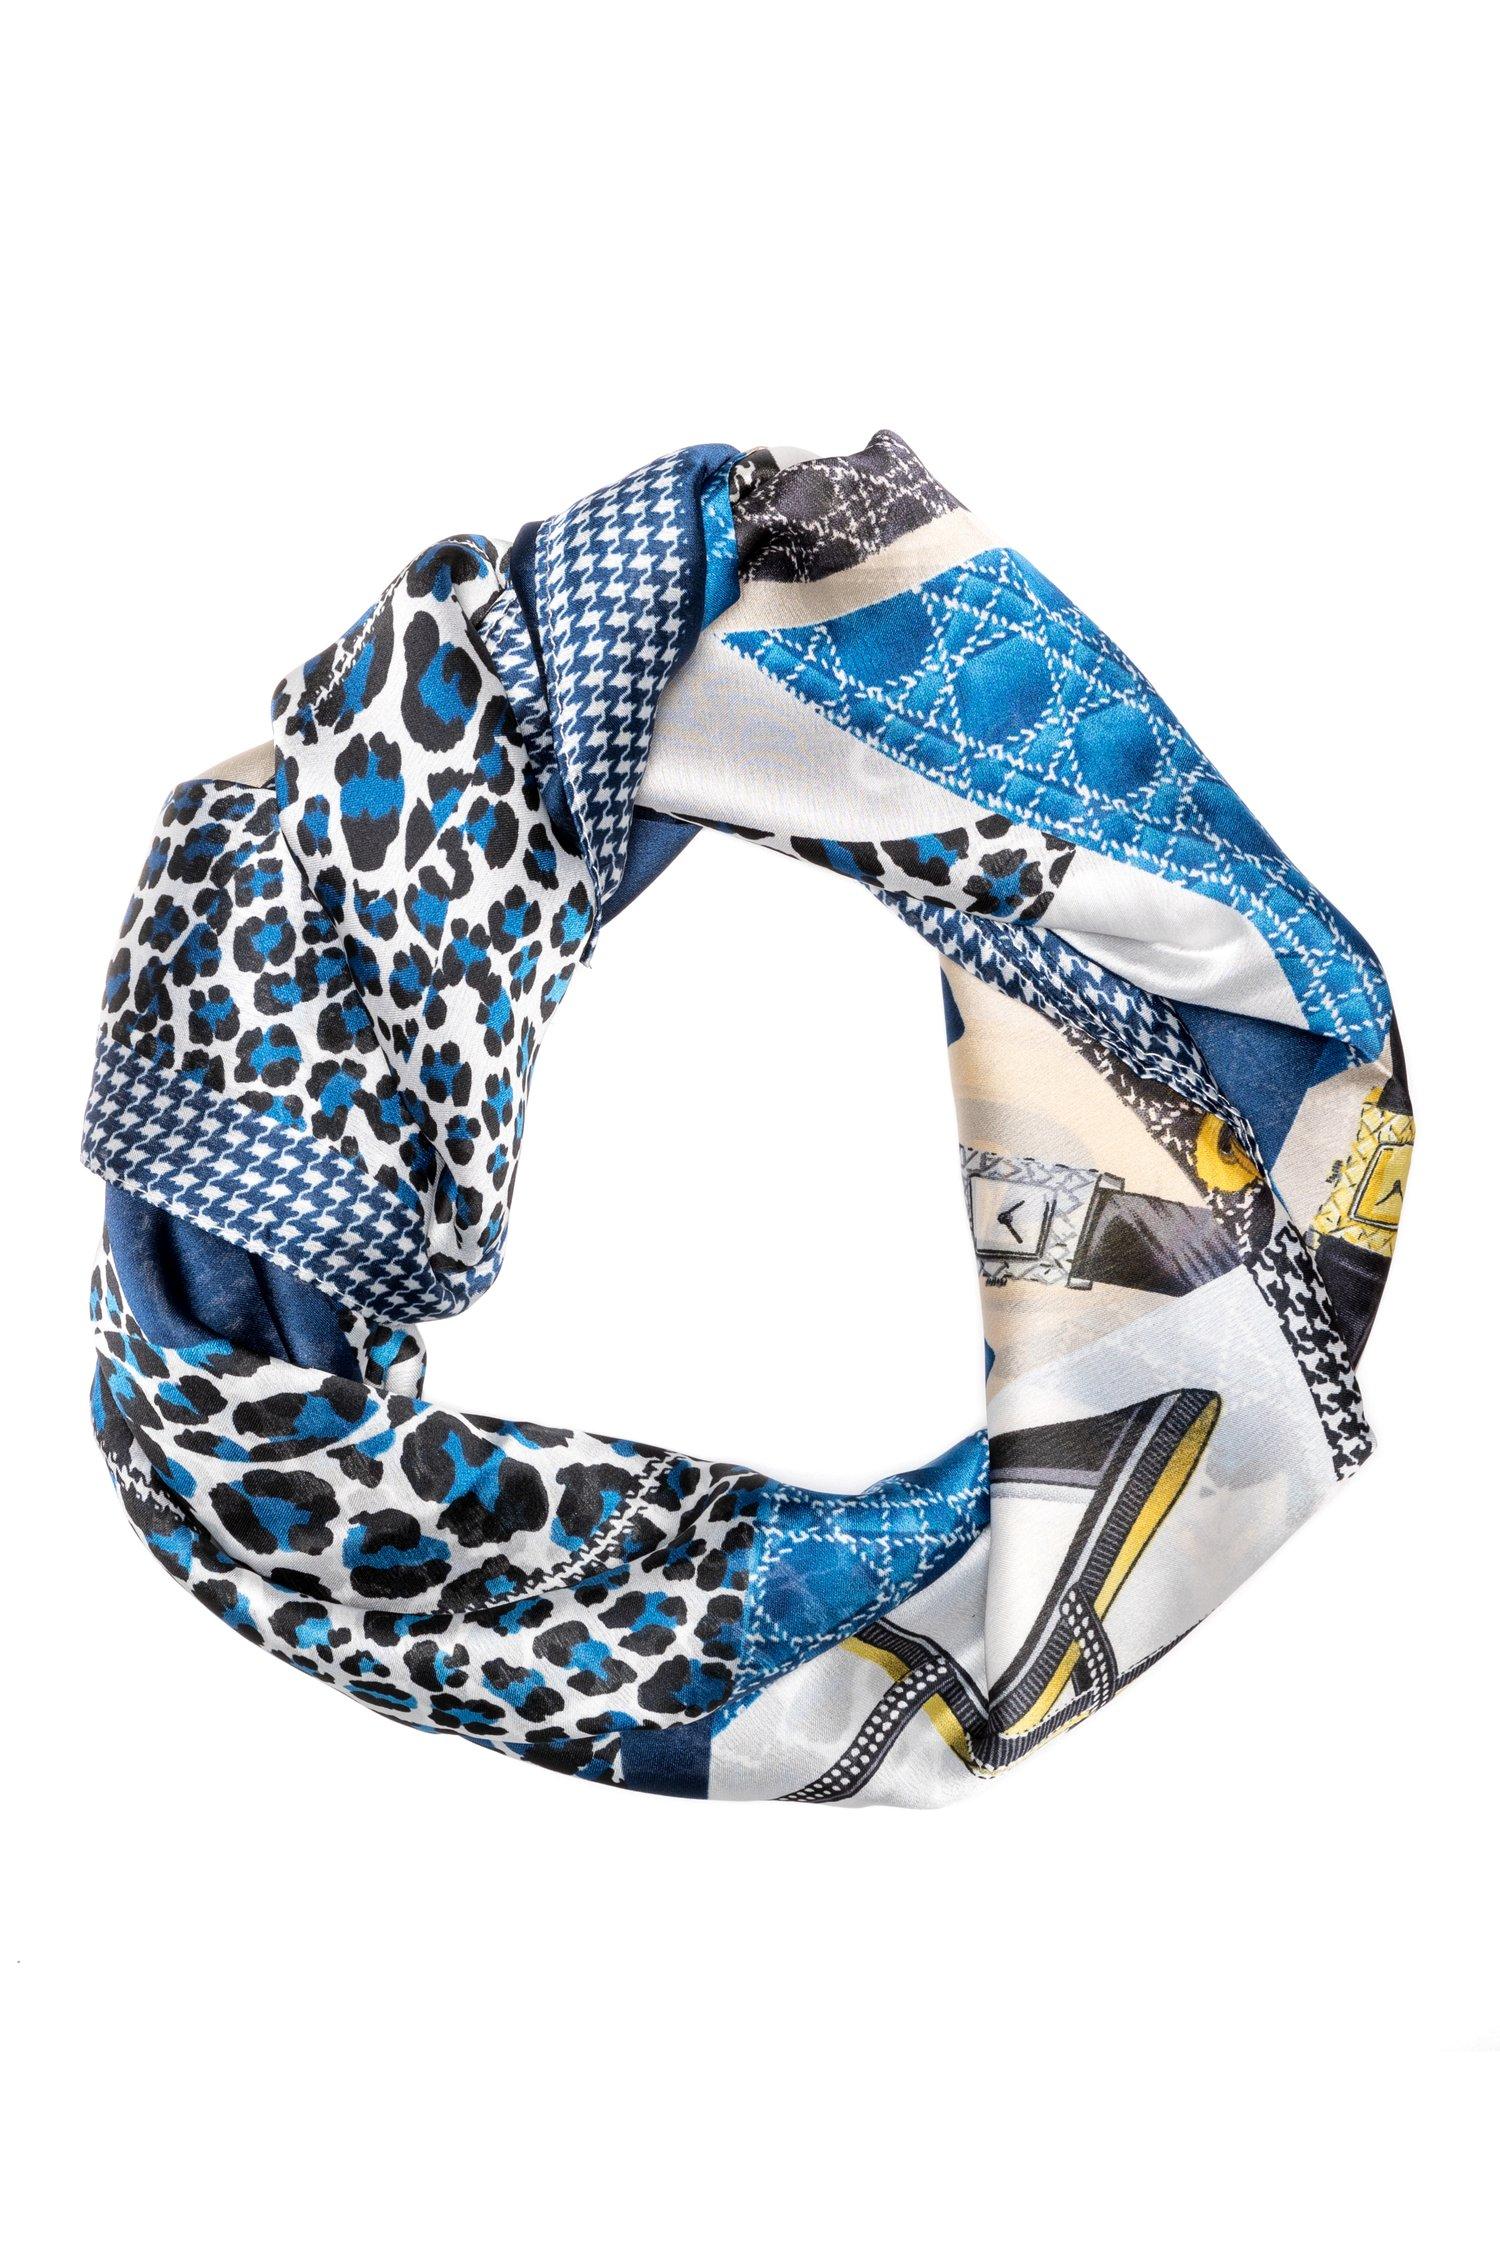 Esarfa gri cu animal print albastru si detalii fashion thumbnail